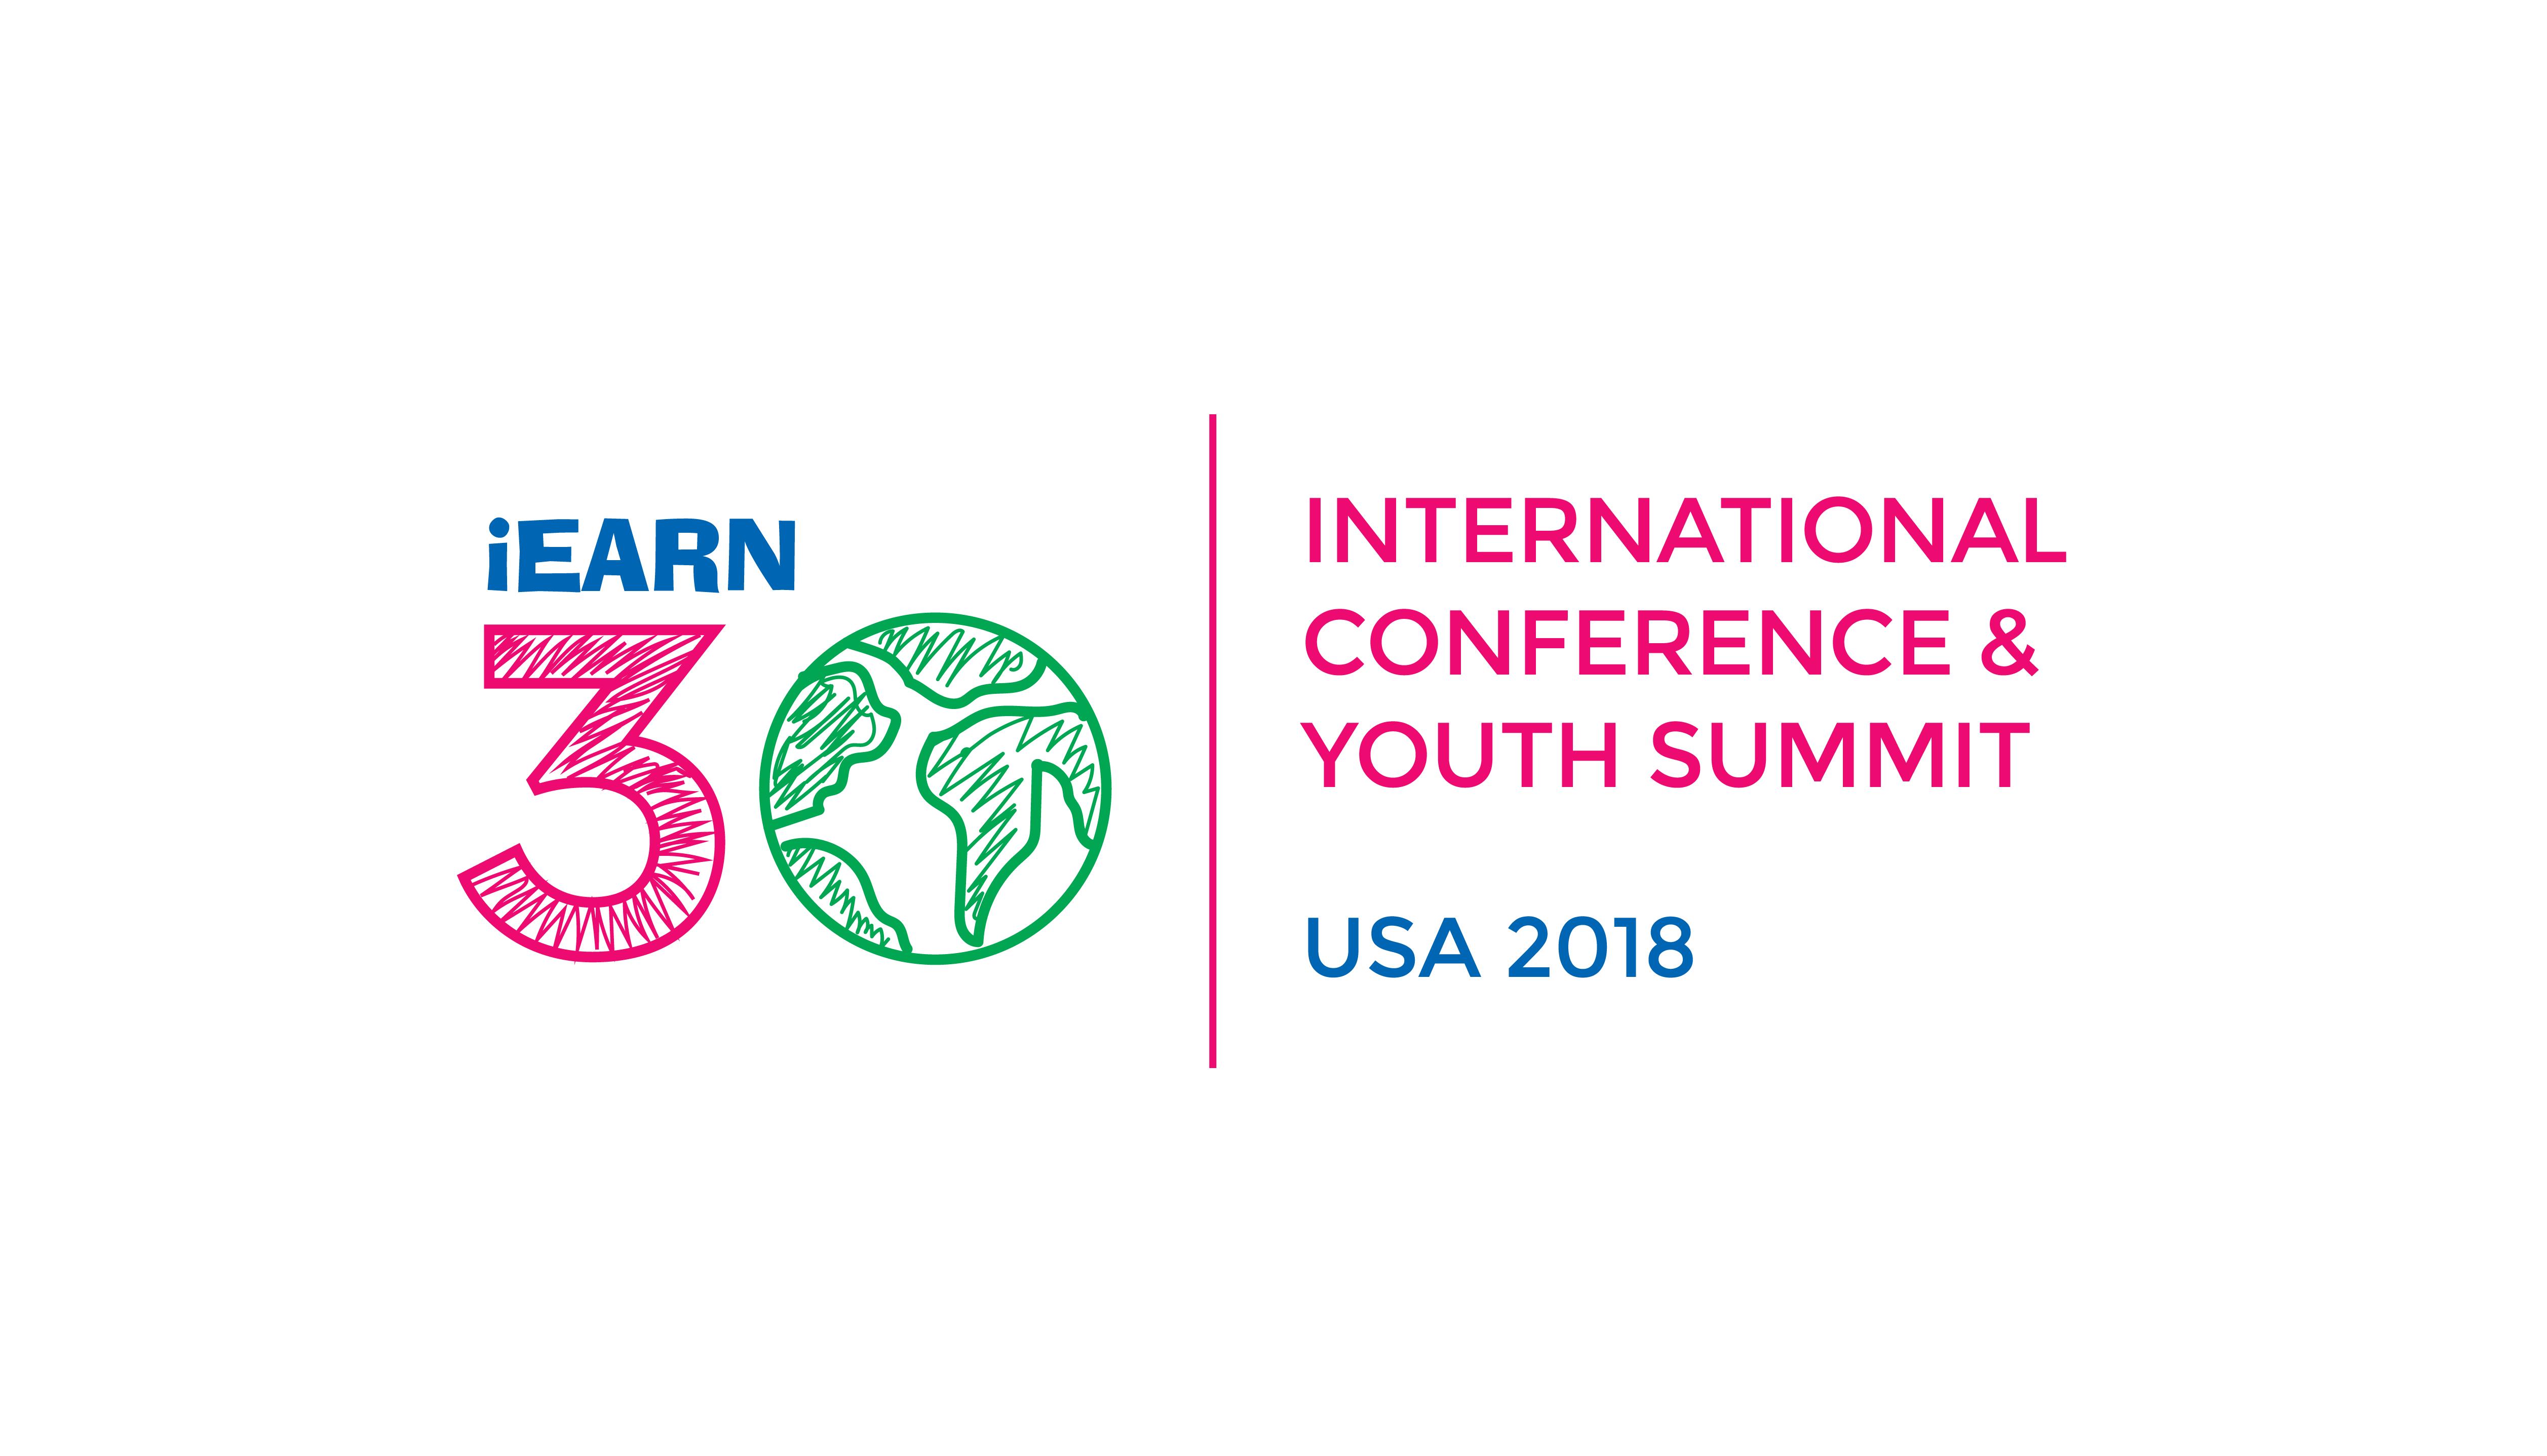 iEARN-USA 2018 Conference Logo